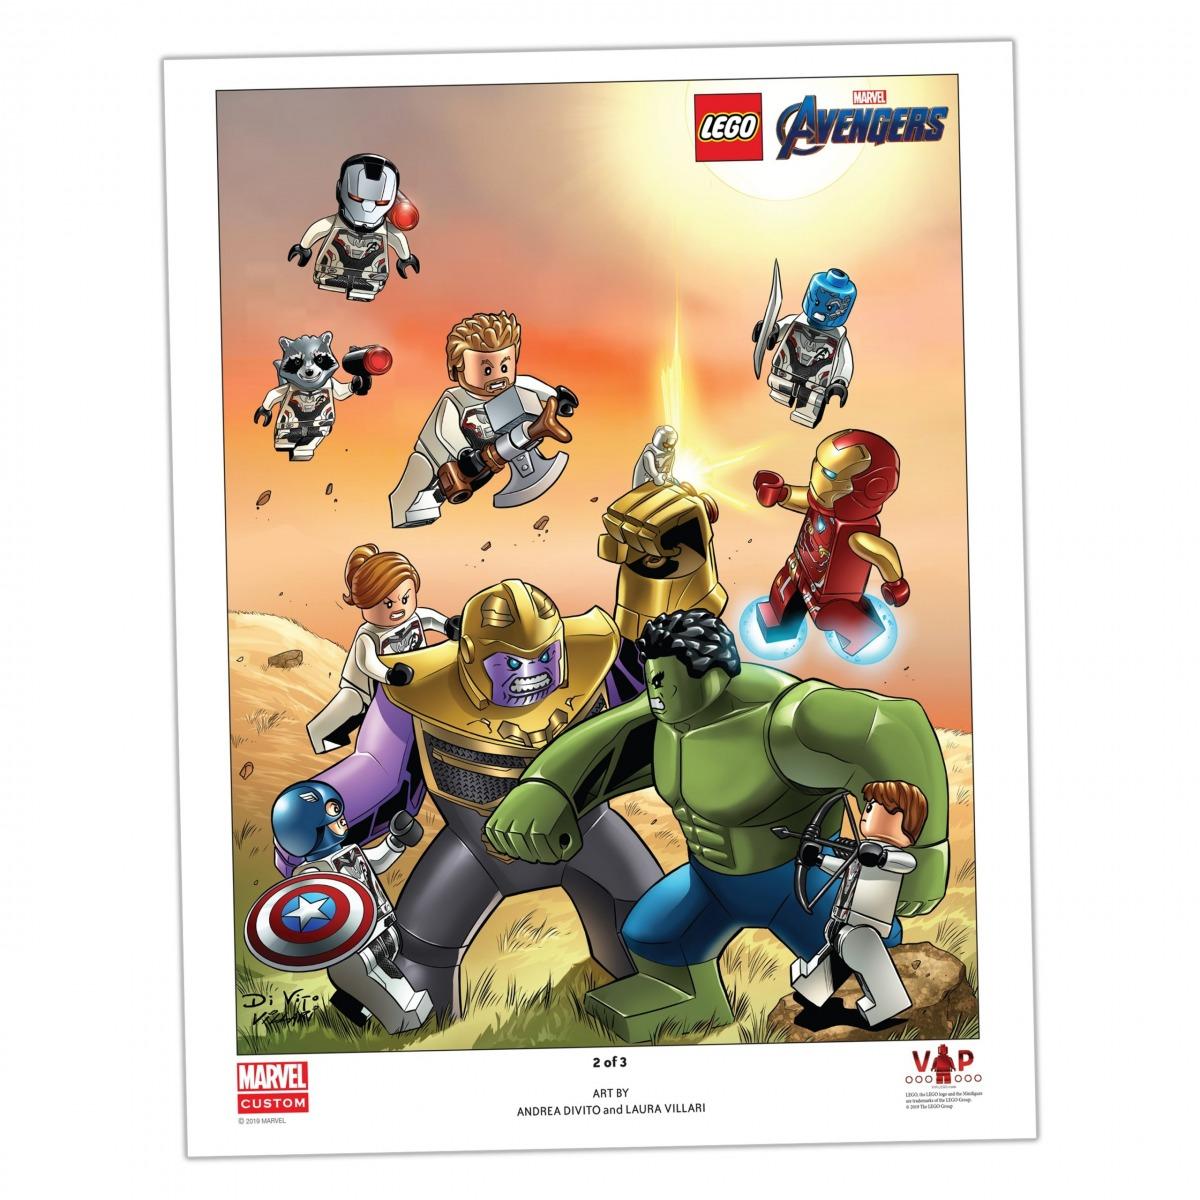 stampa artistica avengers endgame lego 5005881 2 di 3 scaled